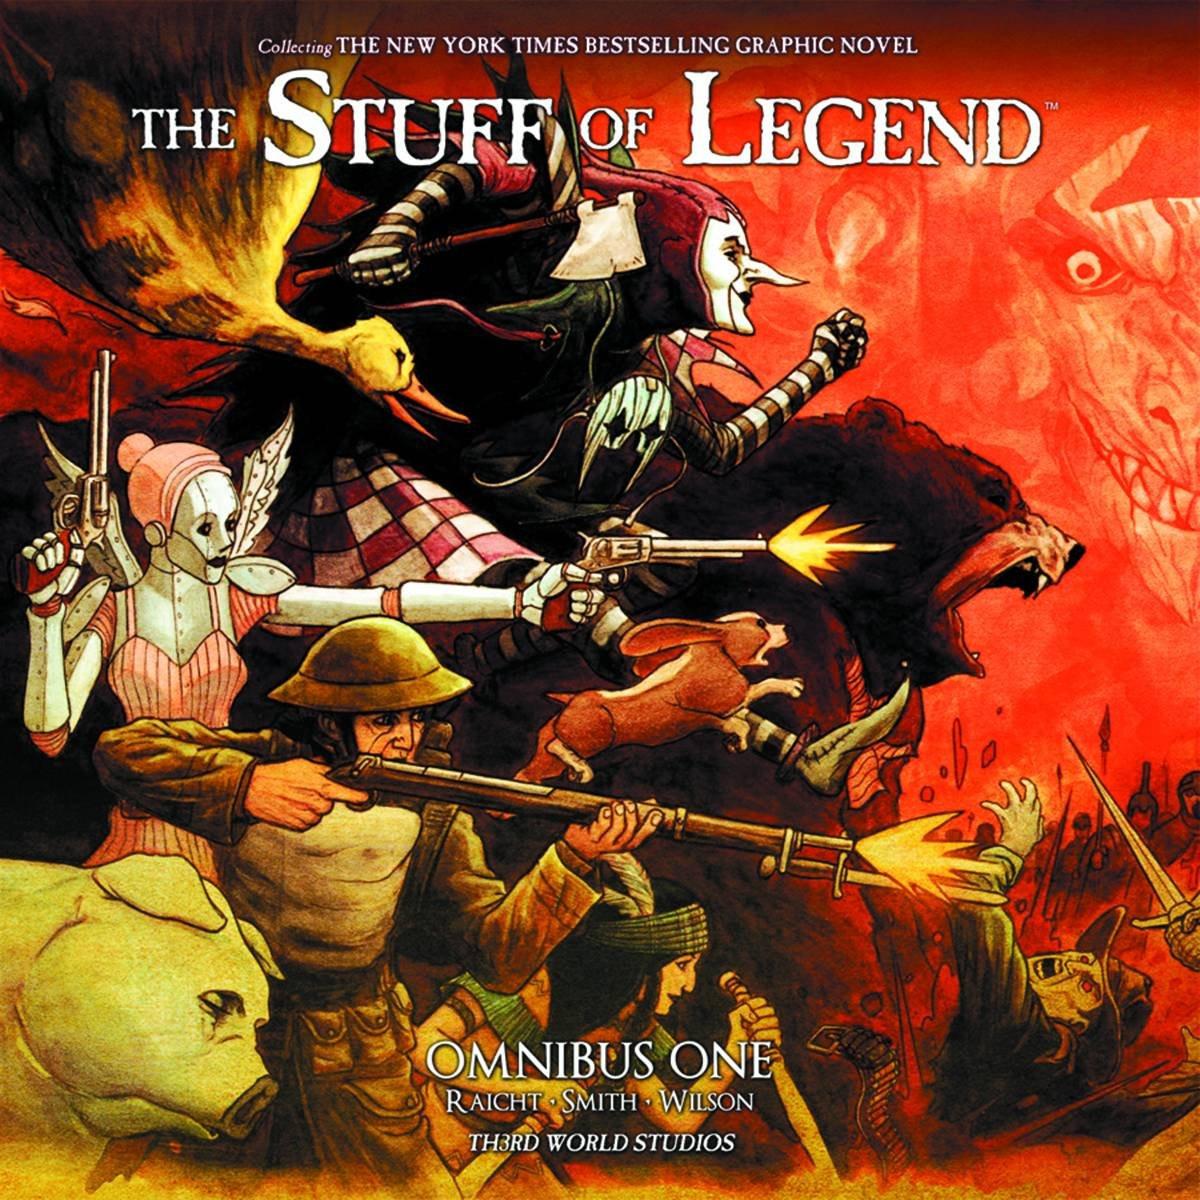 The Stuff of Legend - Omnibus One